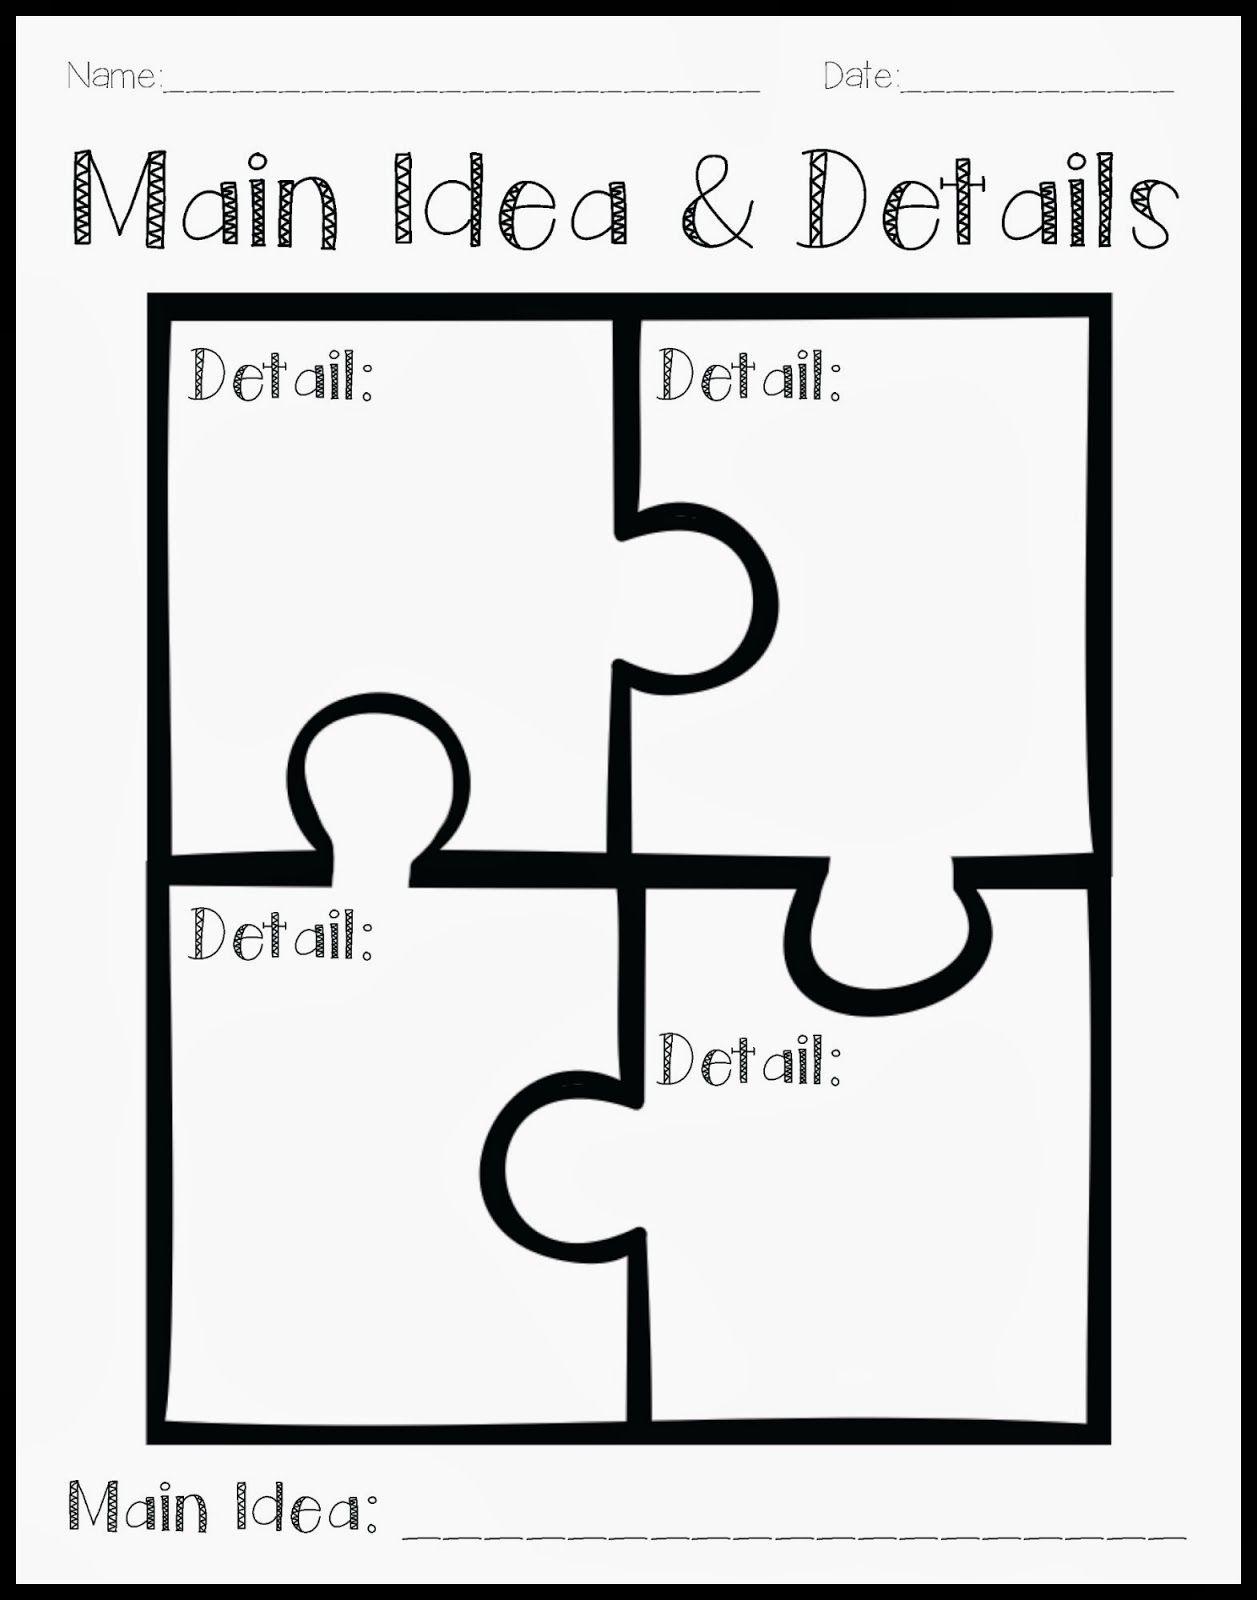 Main Idea Worksheets 2nd Grade